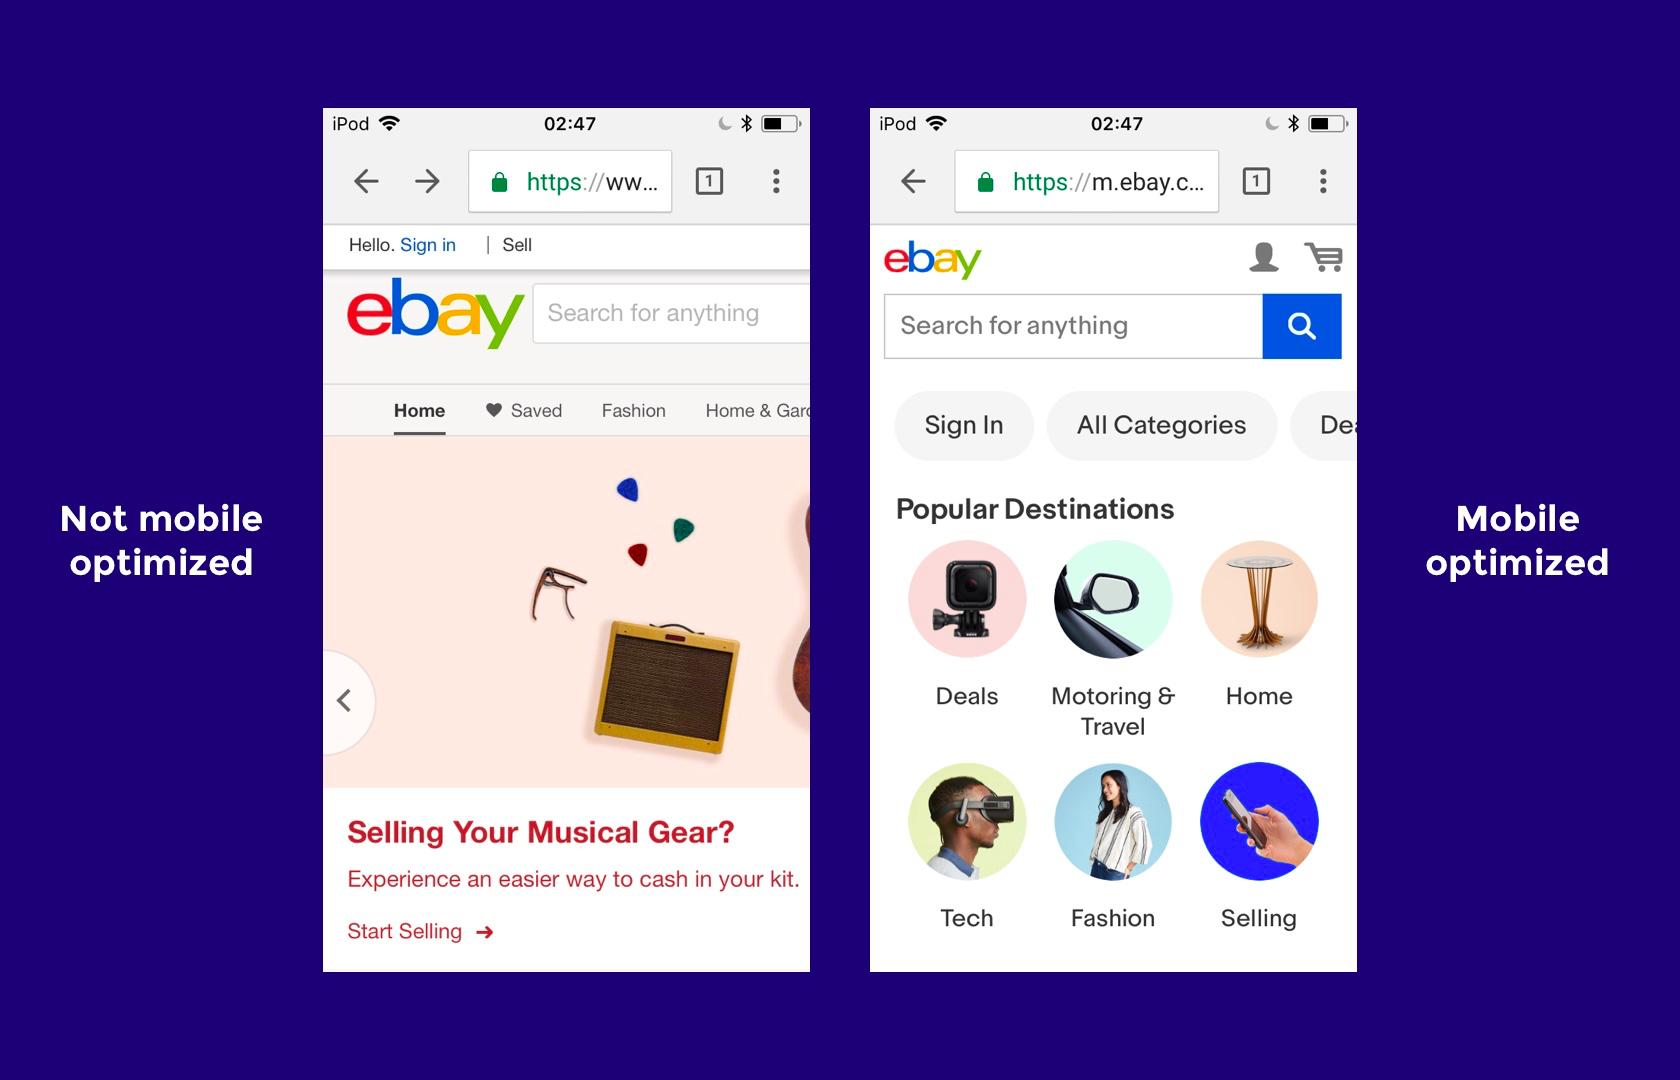 Ebay A Responsive Web Design Example Responsive Web Design Examples Responsive Design Design